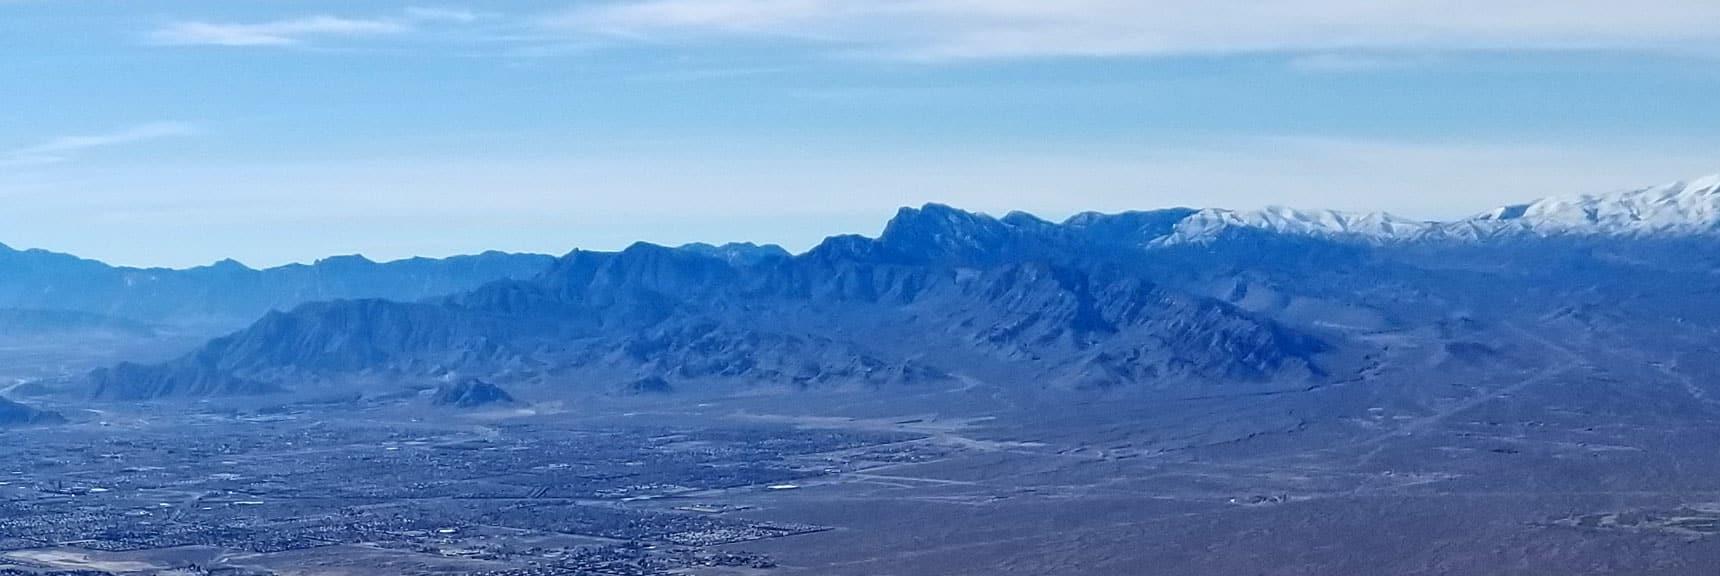 La Madre Mountain Viewed from Gass Peak Summit, Nevada